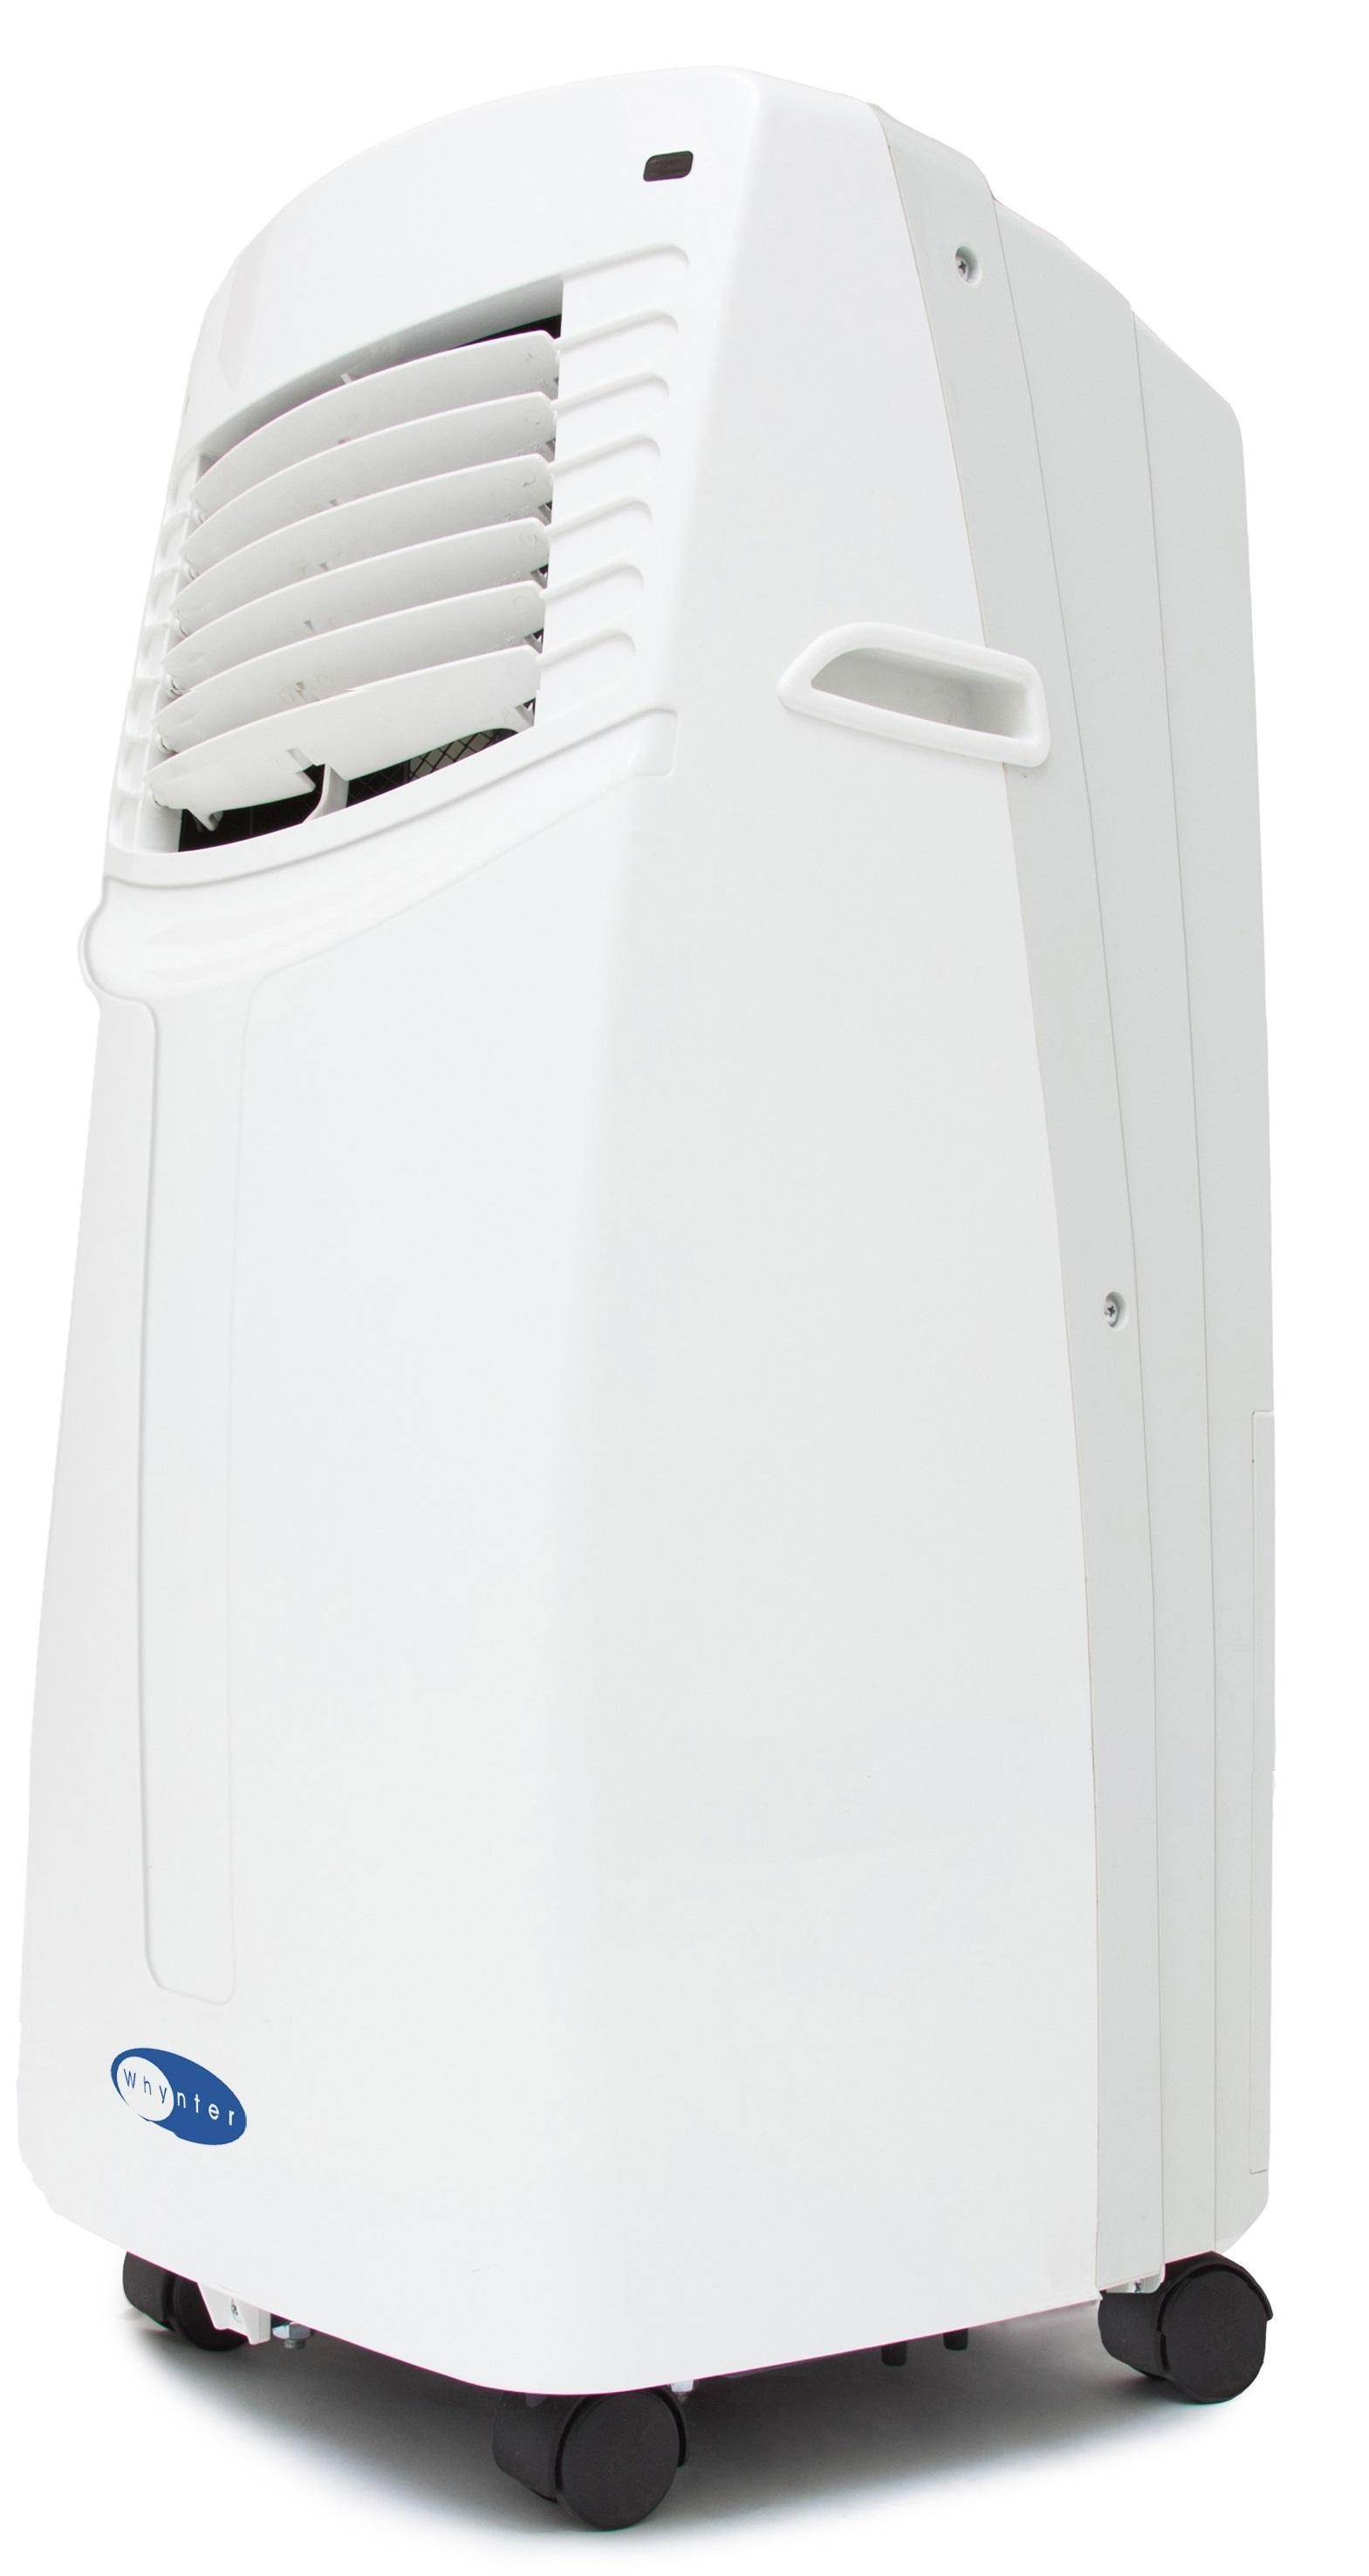 Amazon.com Whynter ARC 08WB Eco Friendly Portable Air Conditioner  #1D4C93